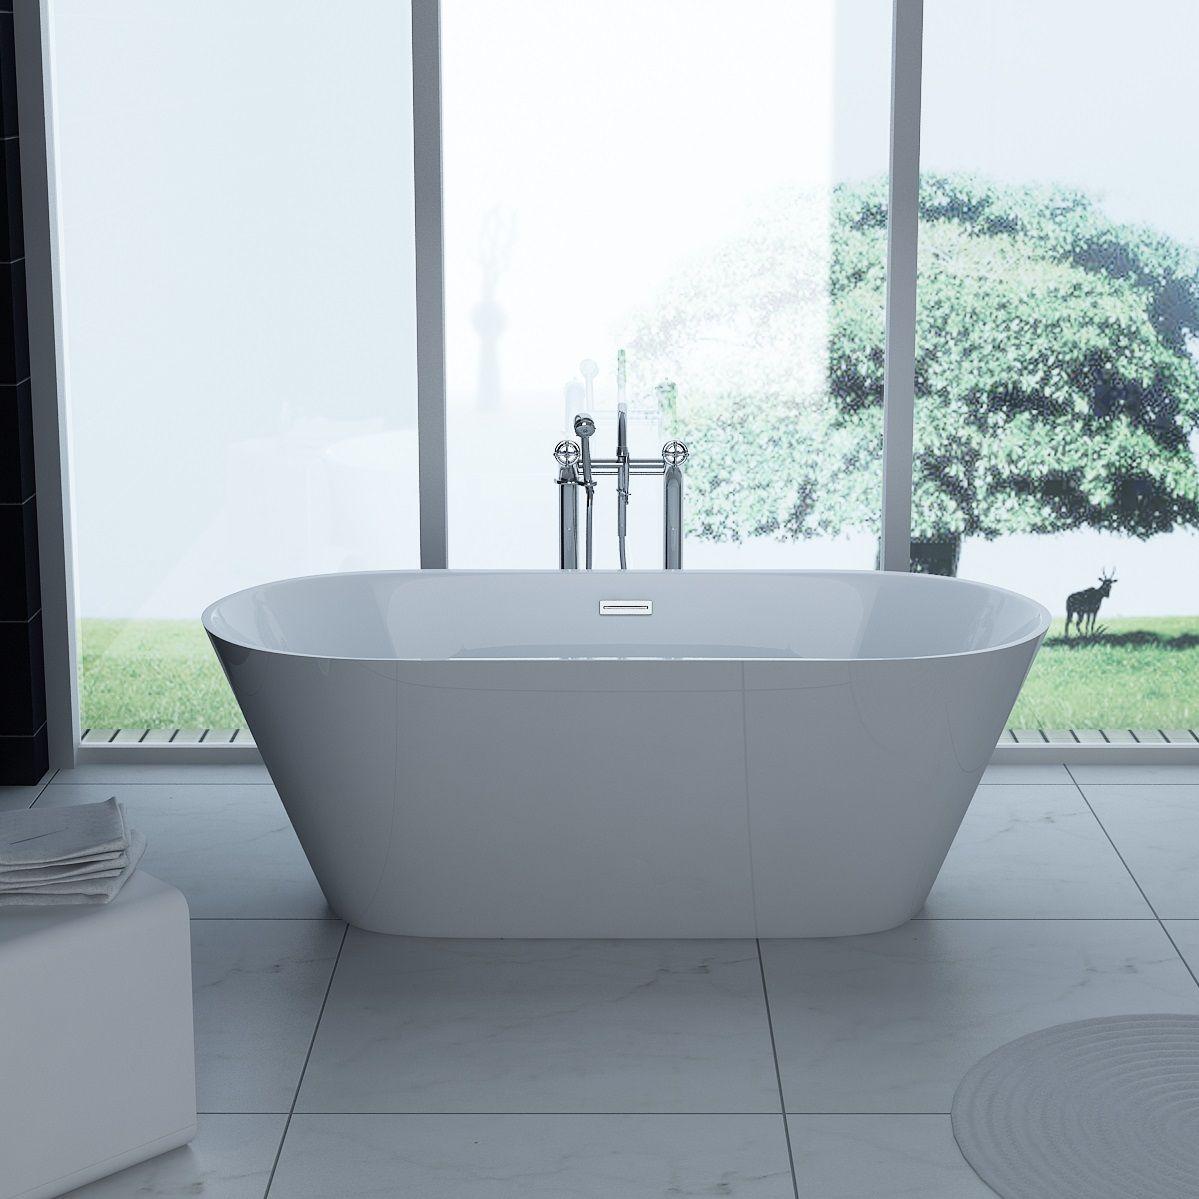 Lugano / Lugio Thin Edge Modern Double Ended Freestanding Bath ...